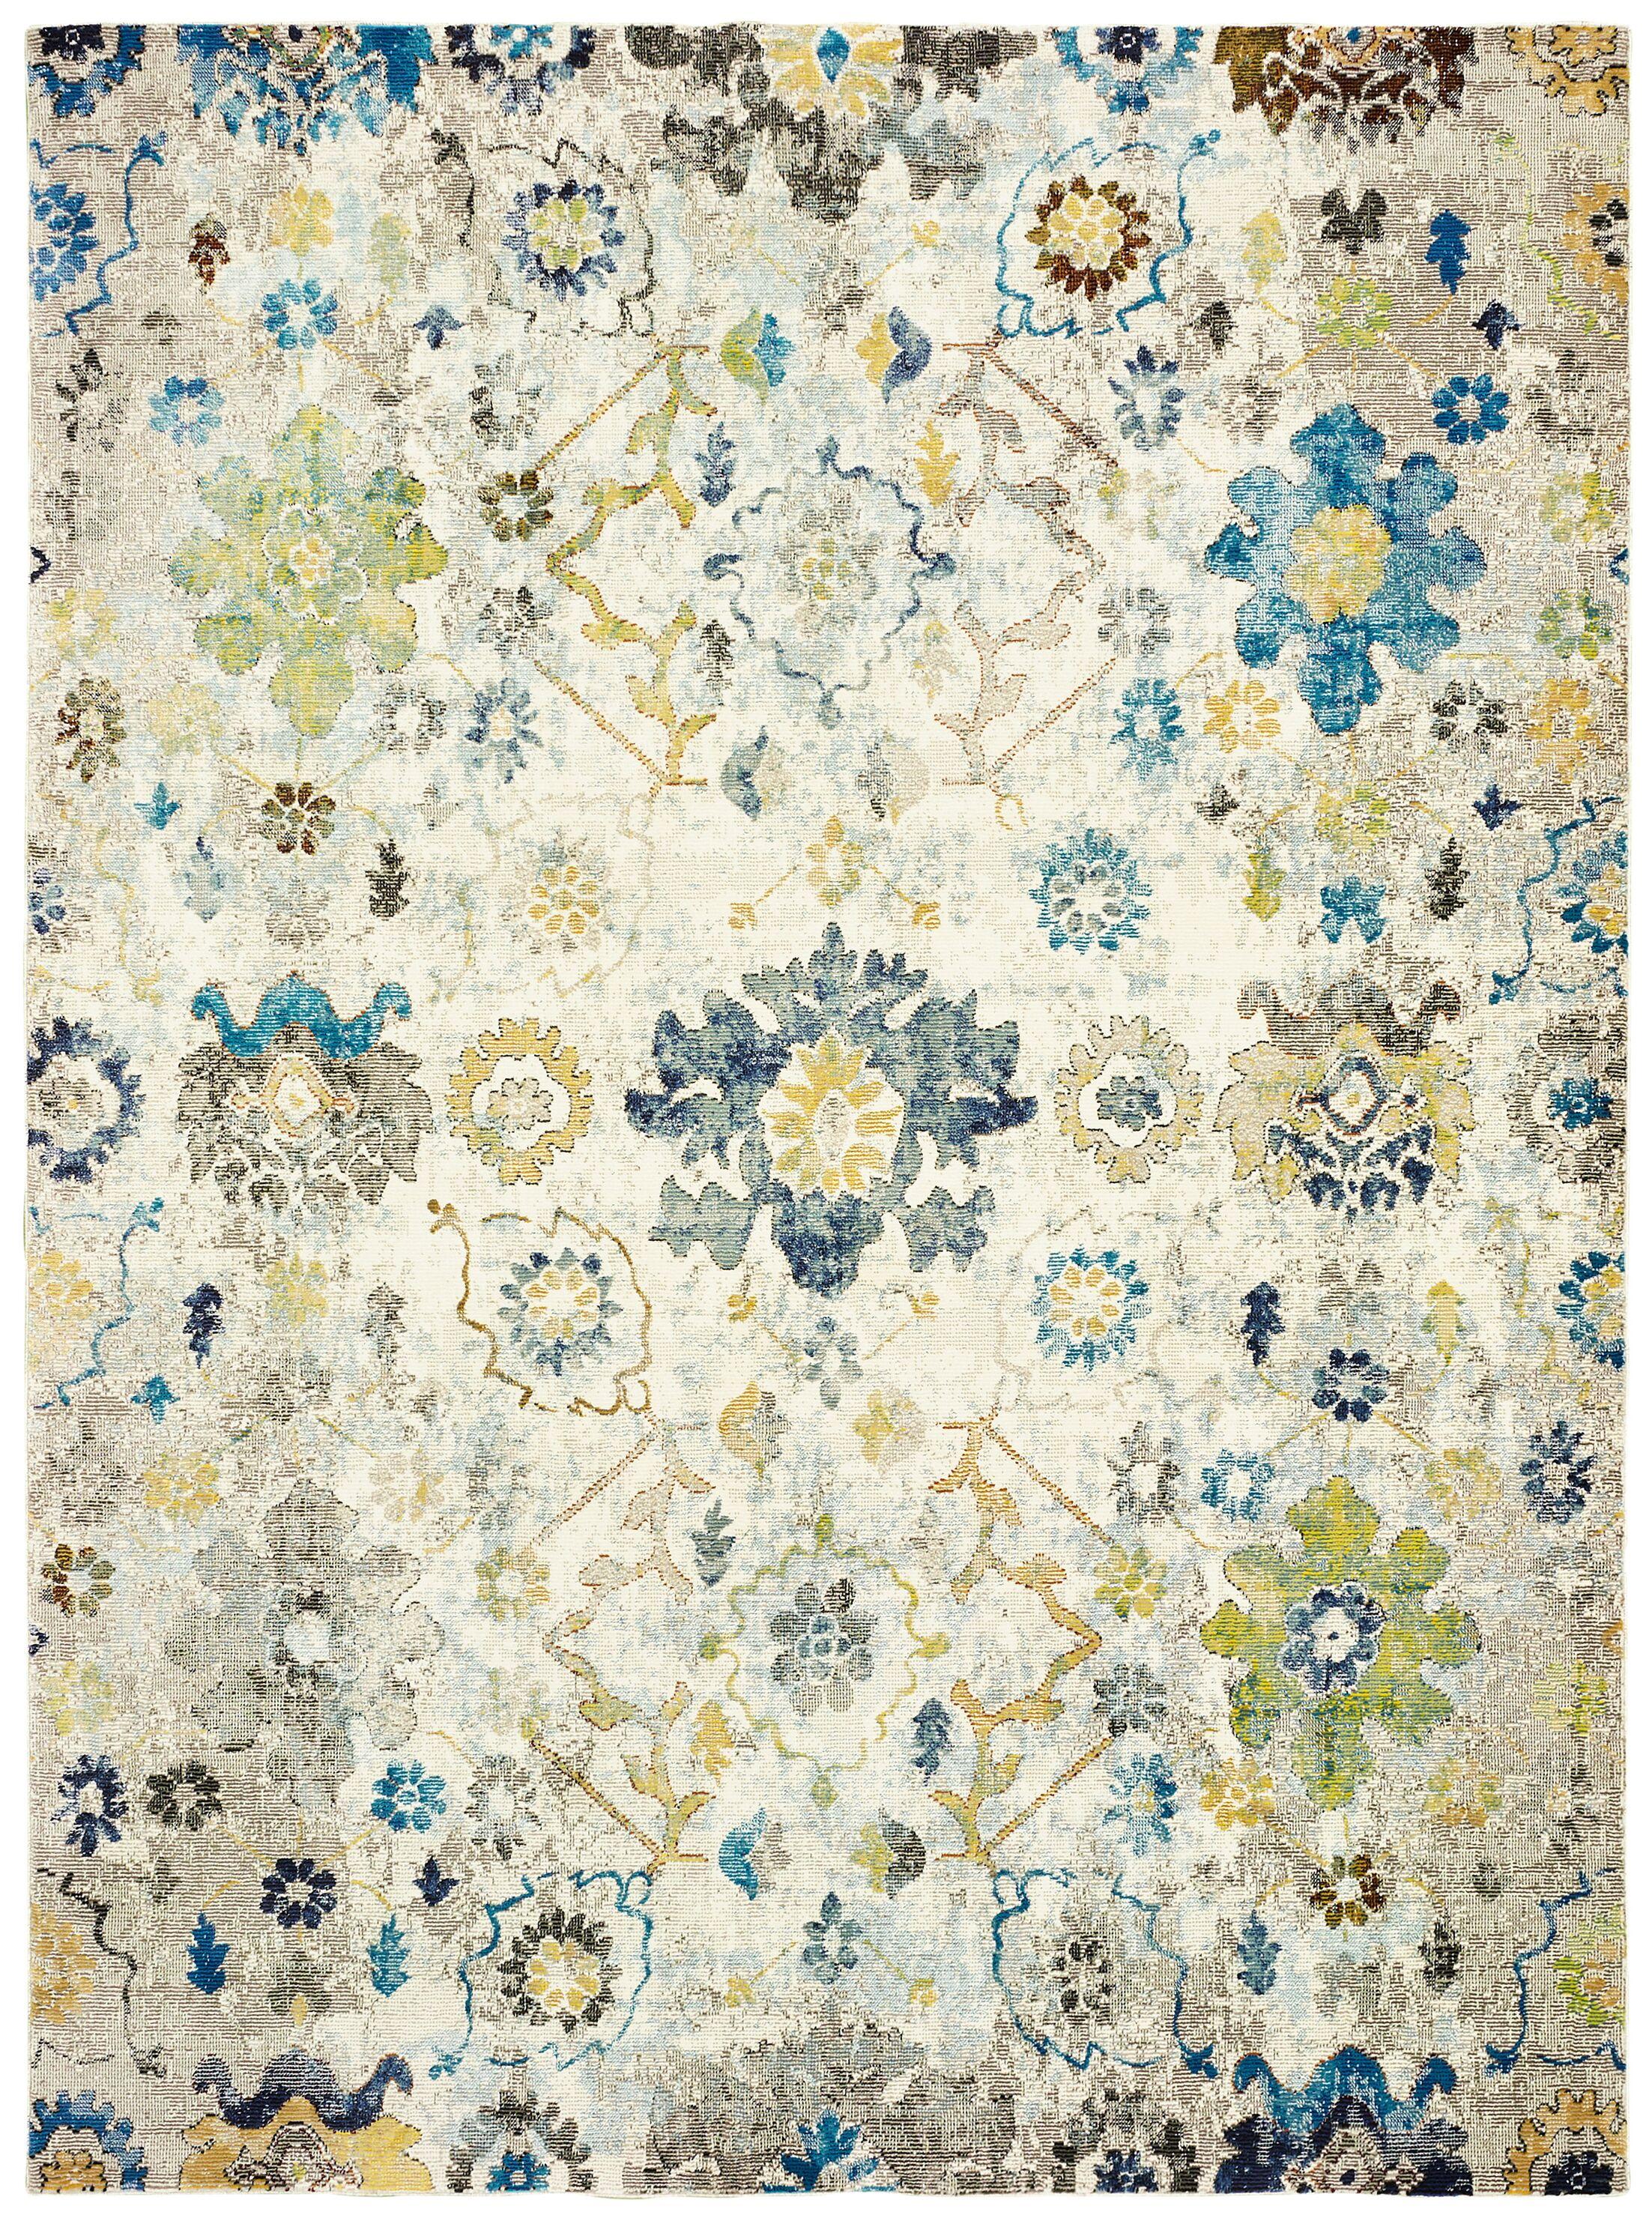 Amory Distressed Botanical Cream/Gray/Blue Area Rug Rug Size: Rectangle 8'9